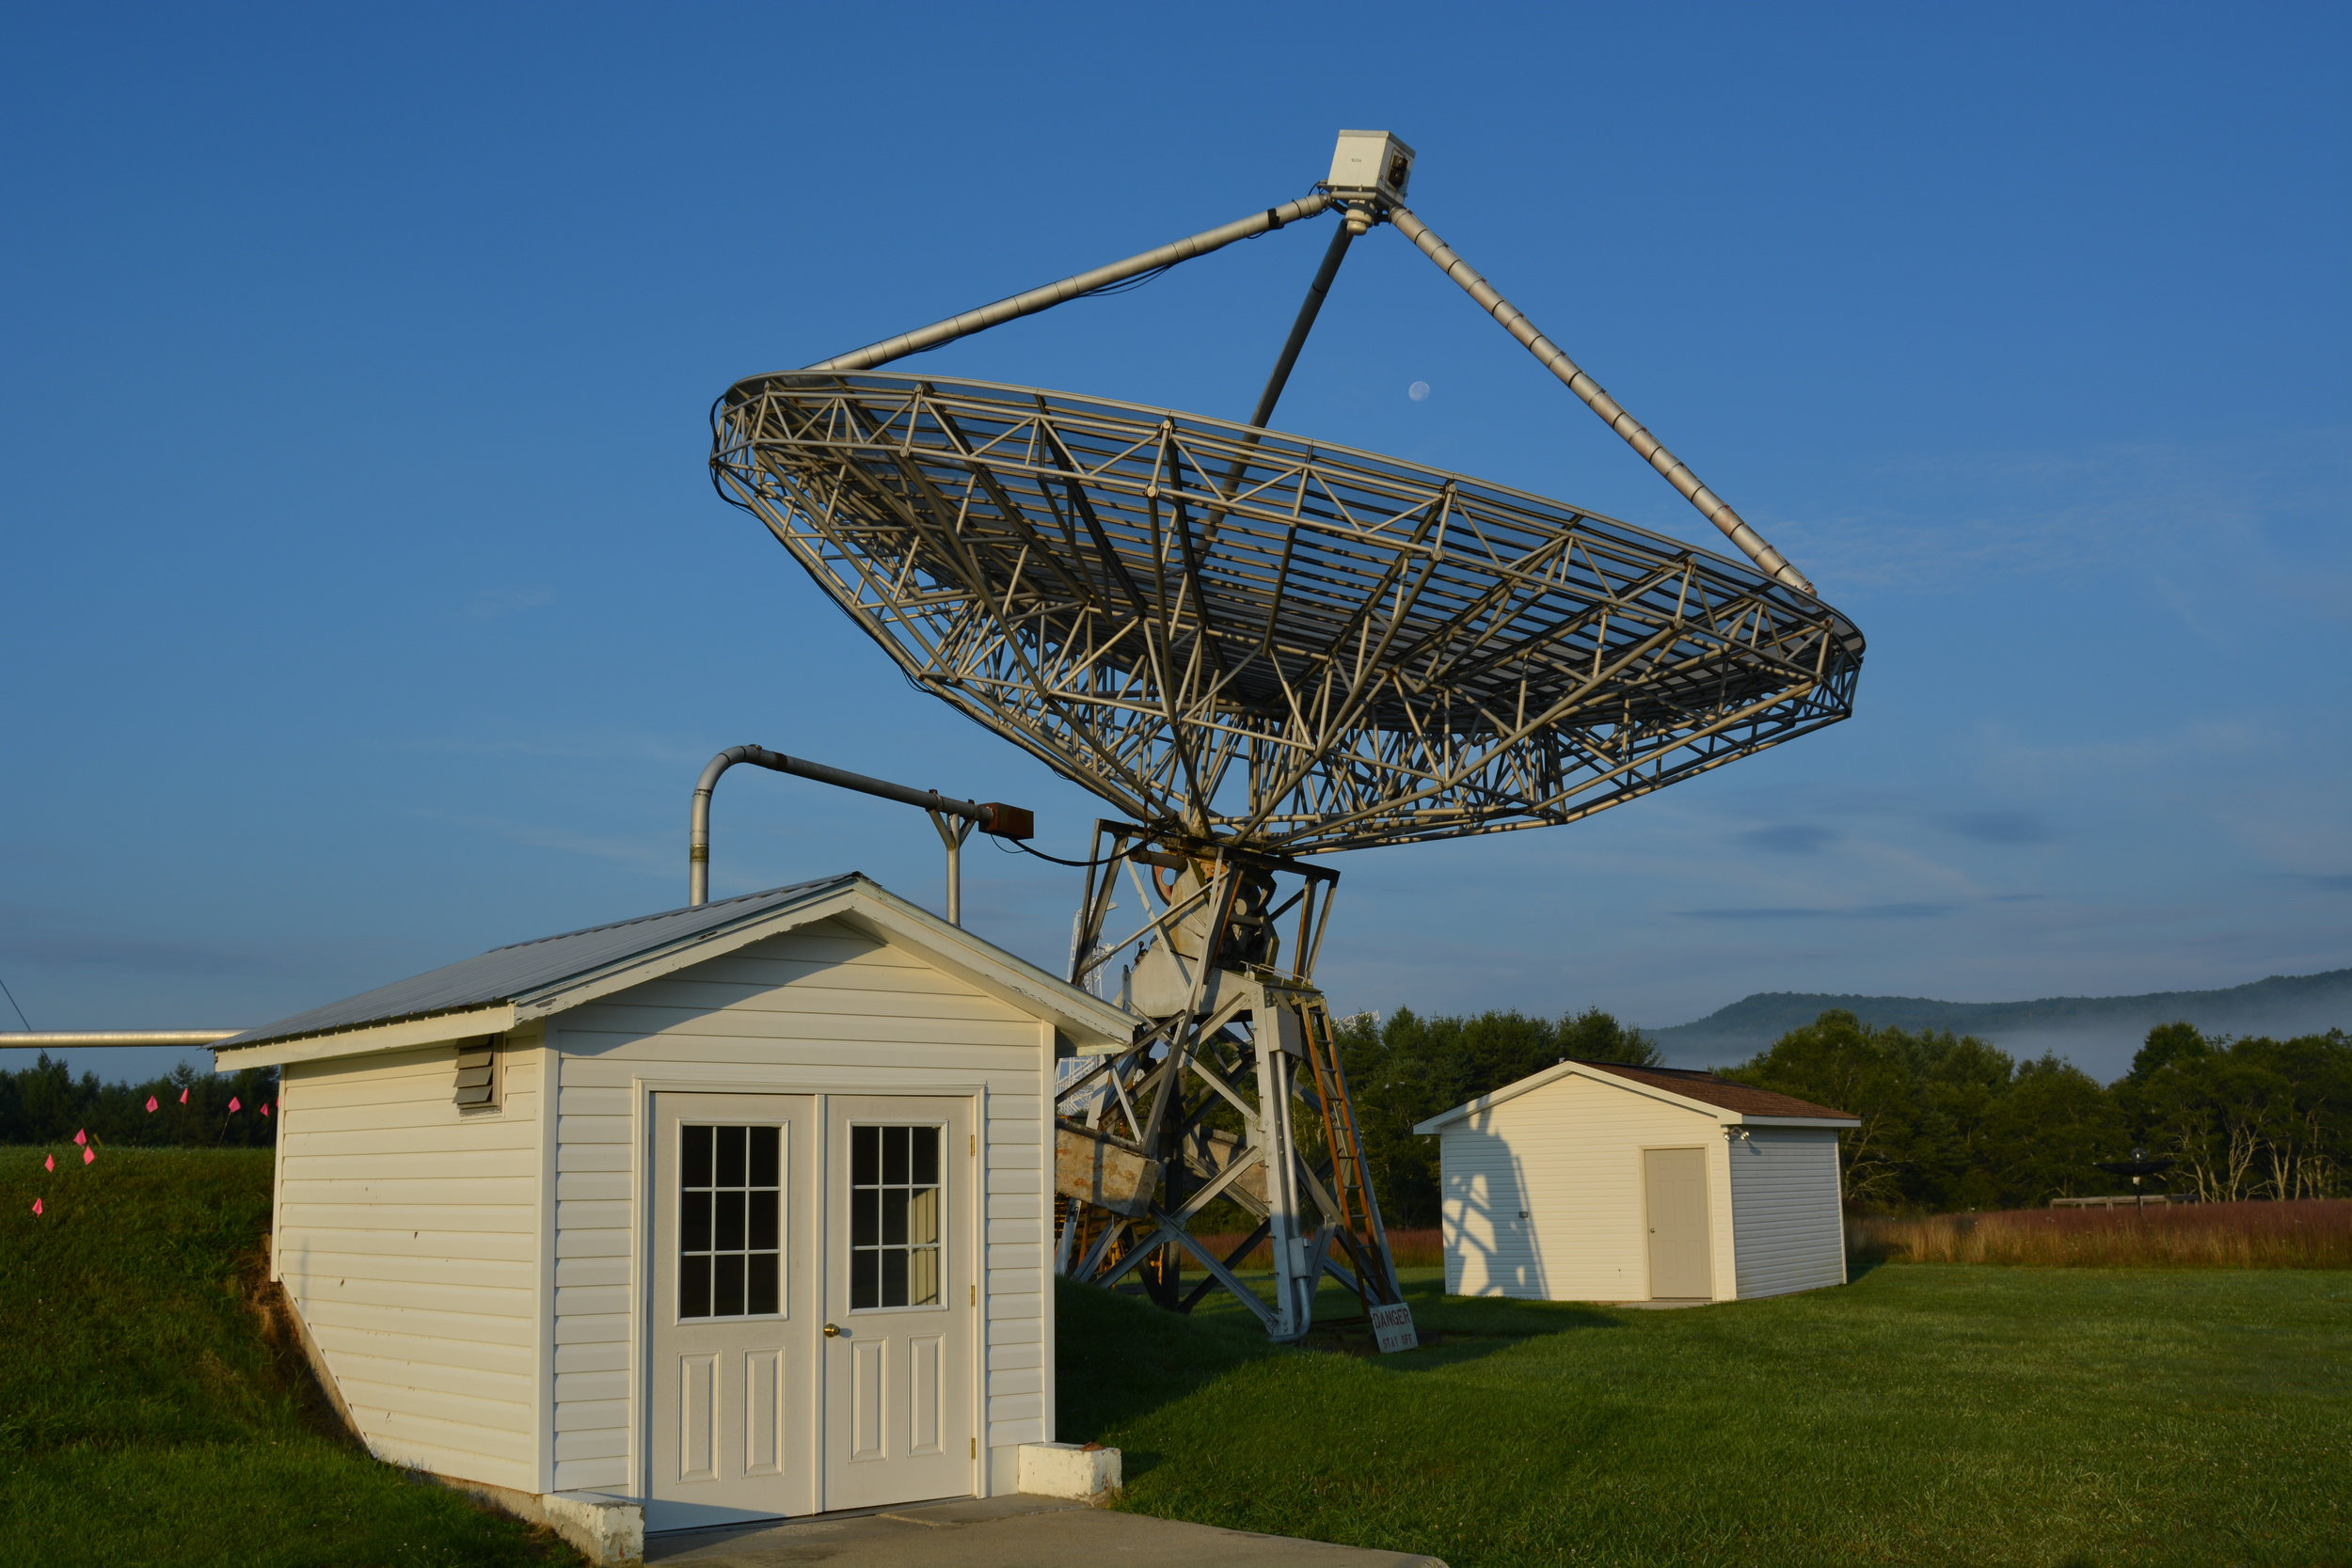 GBO's fully manual 40-foot diameter teaching radio telescope.